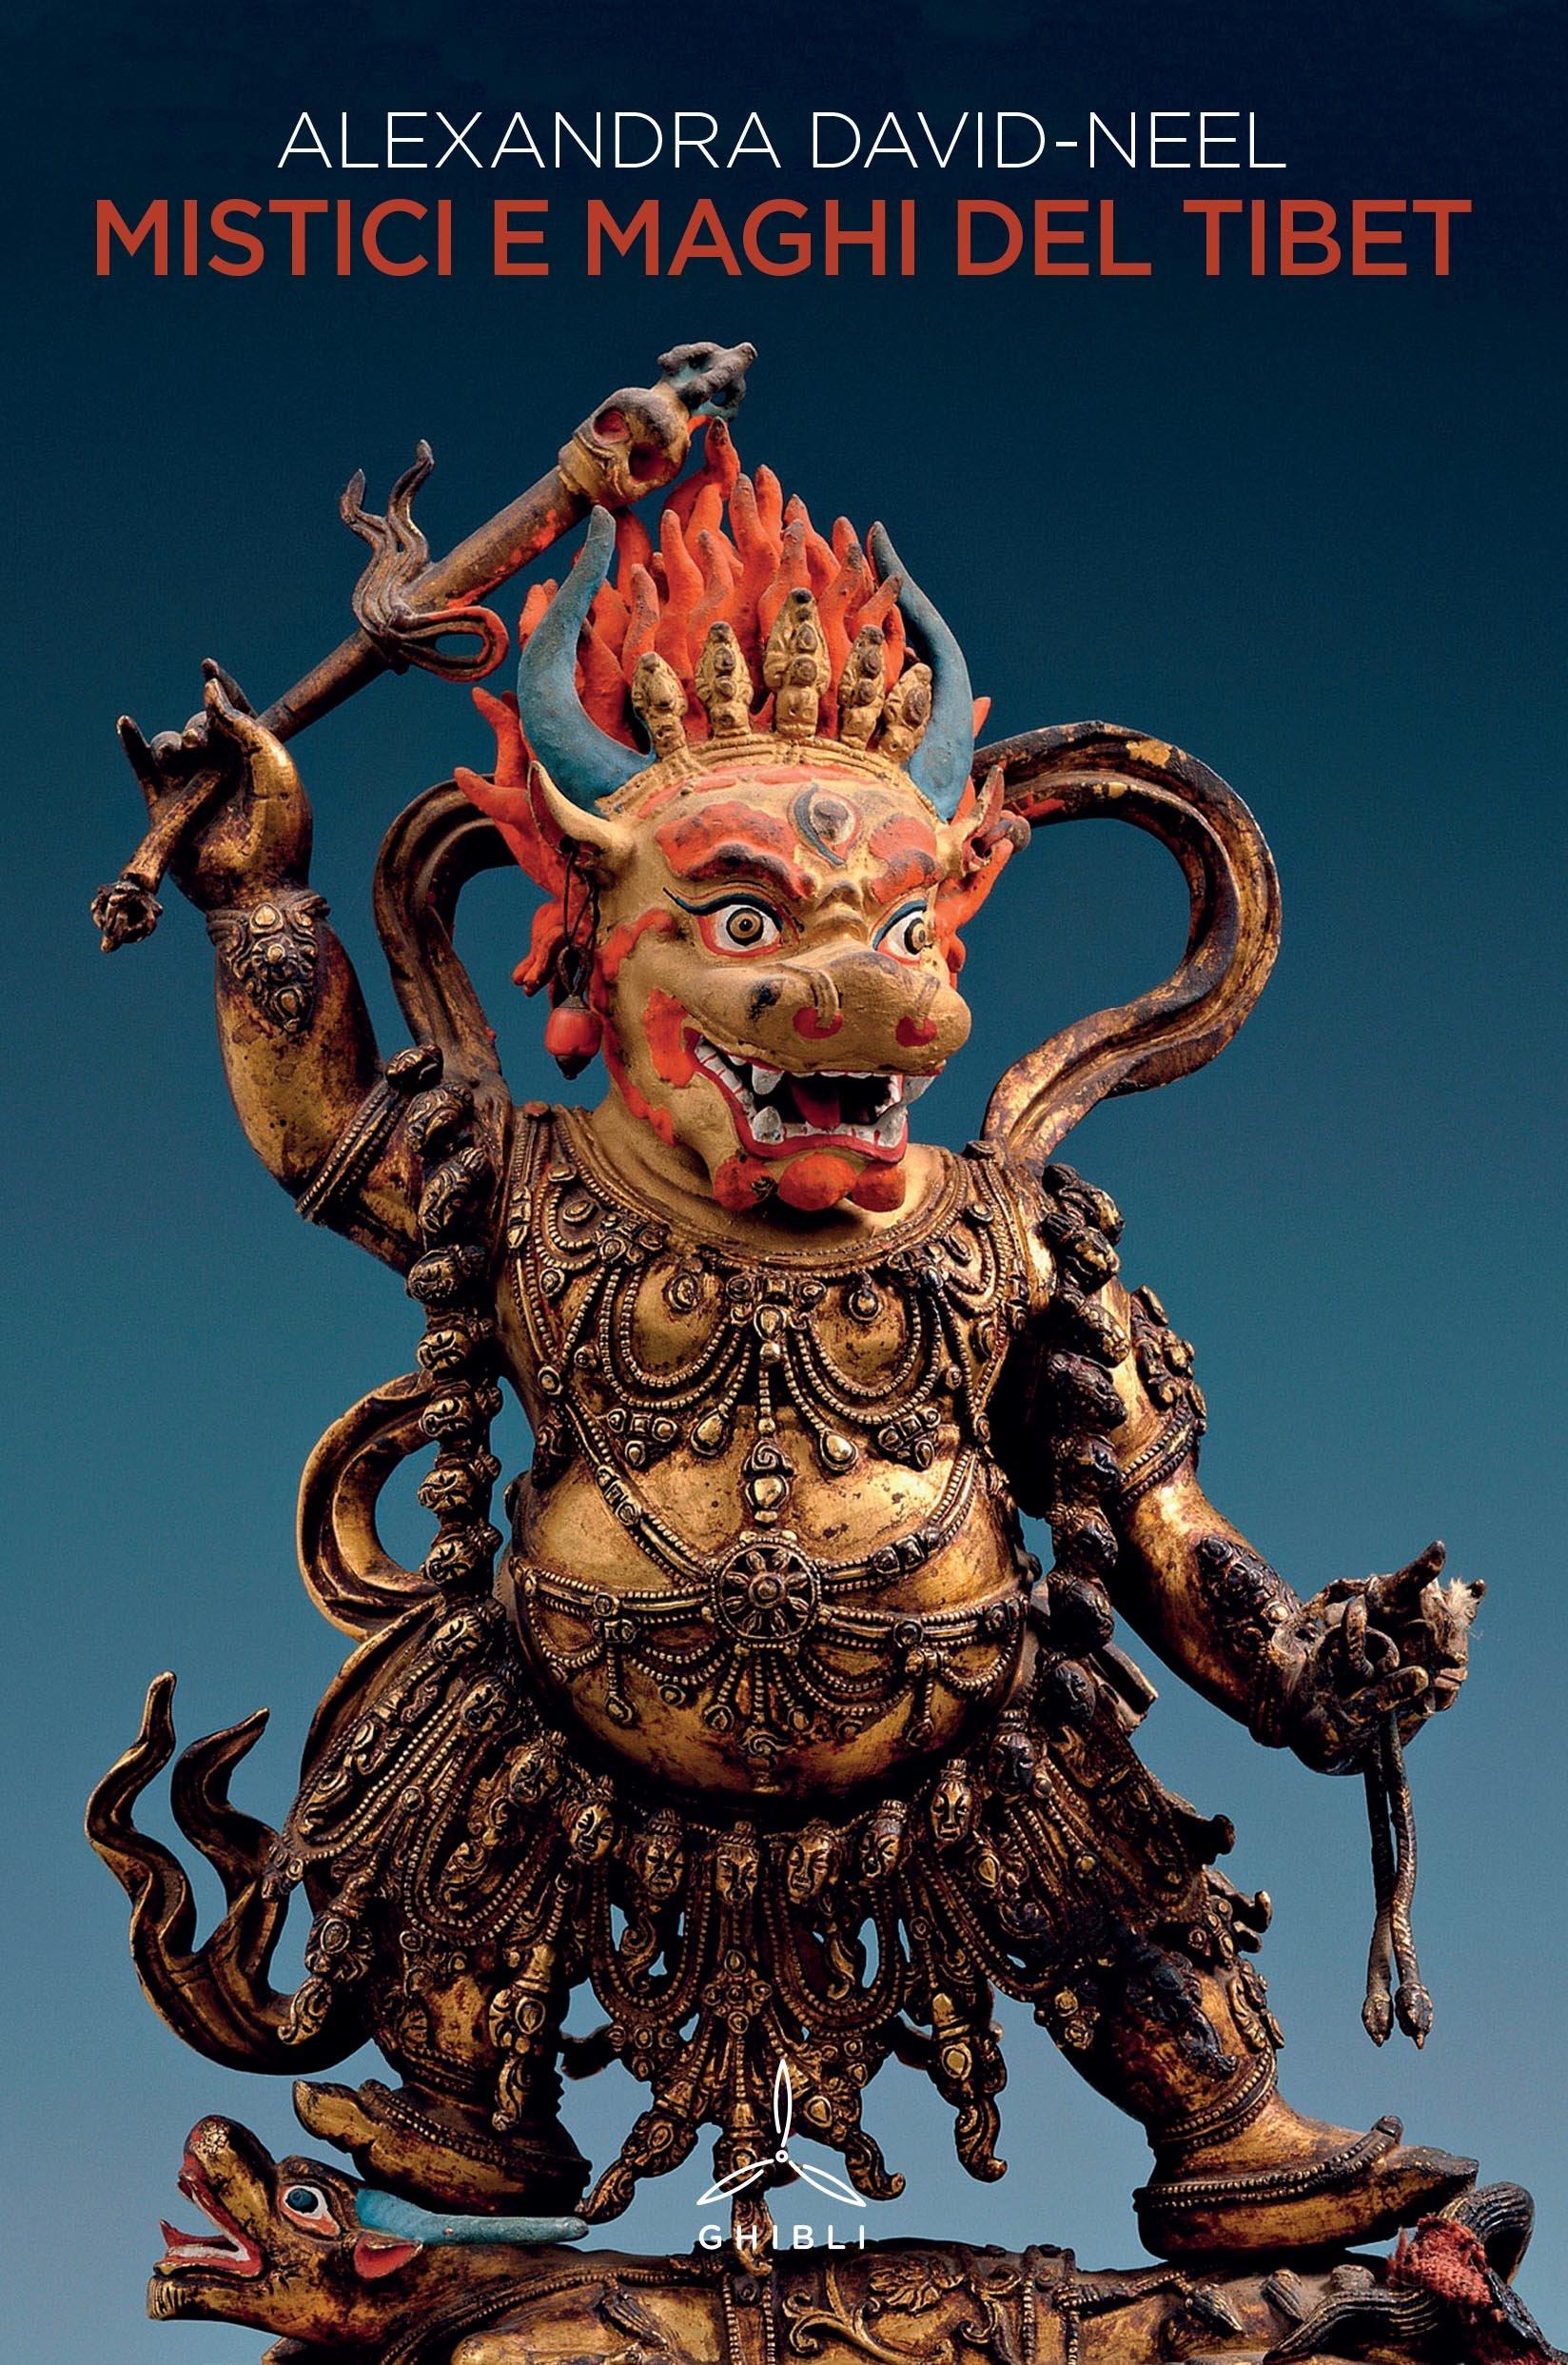 Mistici e maghi del Tibet Copertina flessibile – 10 nov 2016 Alexandra David-Néel Ghibli 8868011484 Buddismo Zen